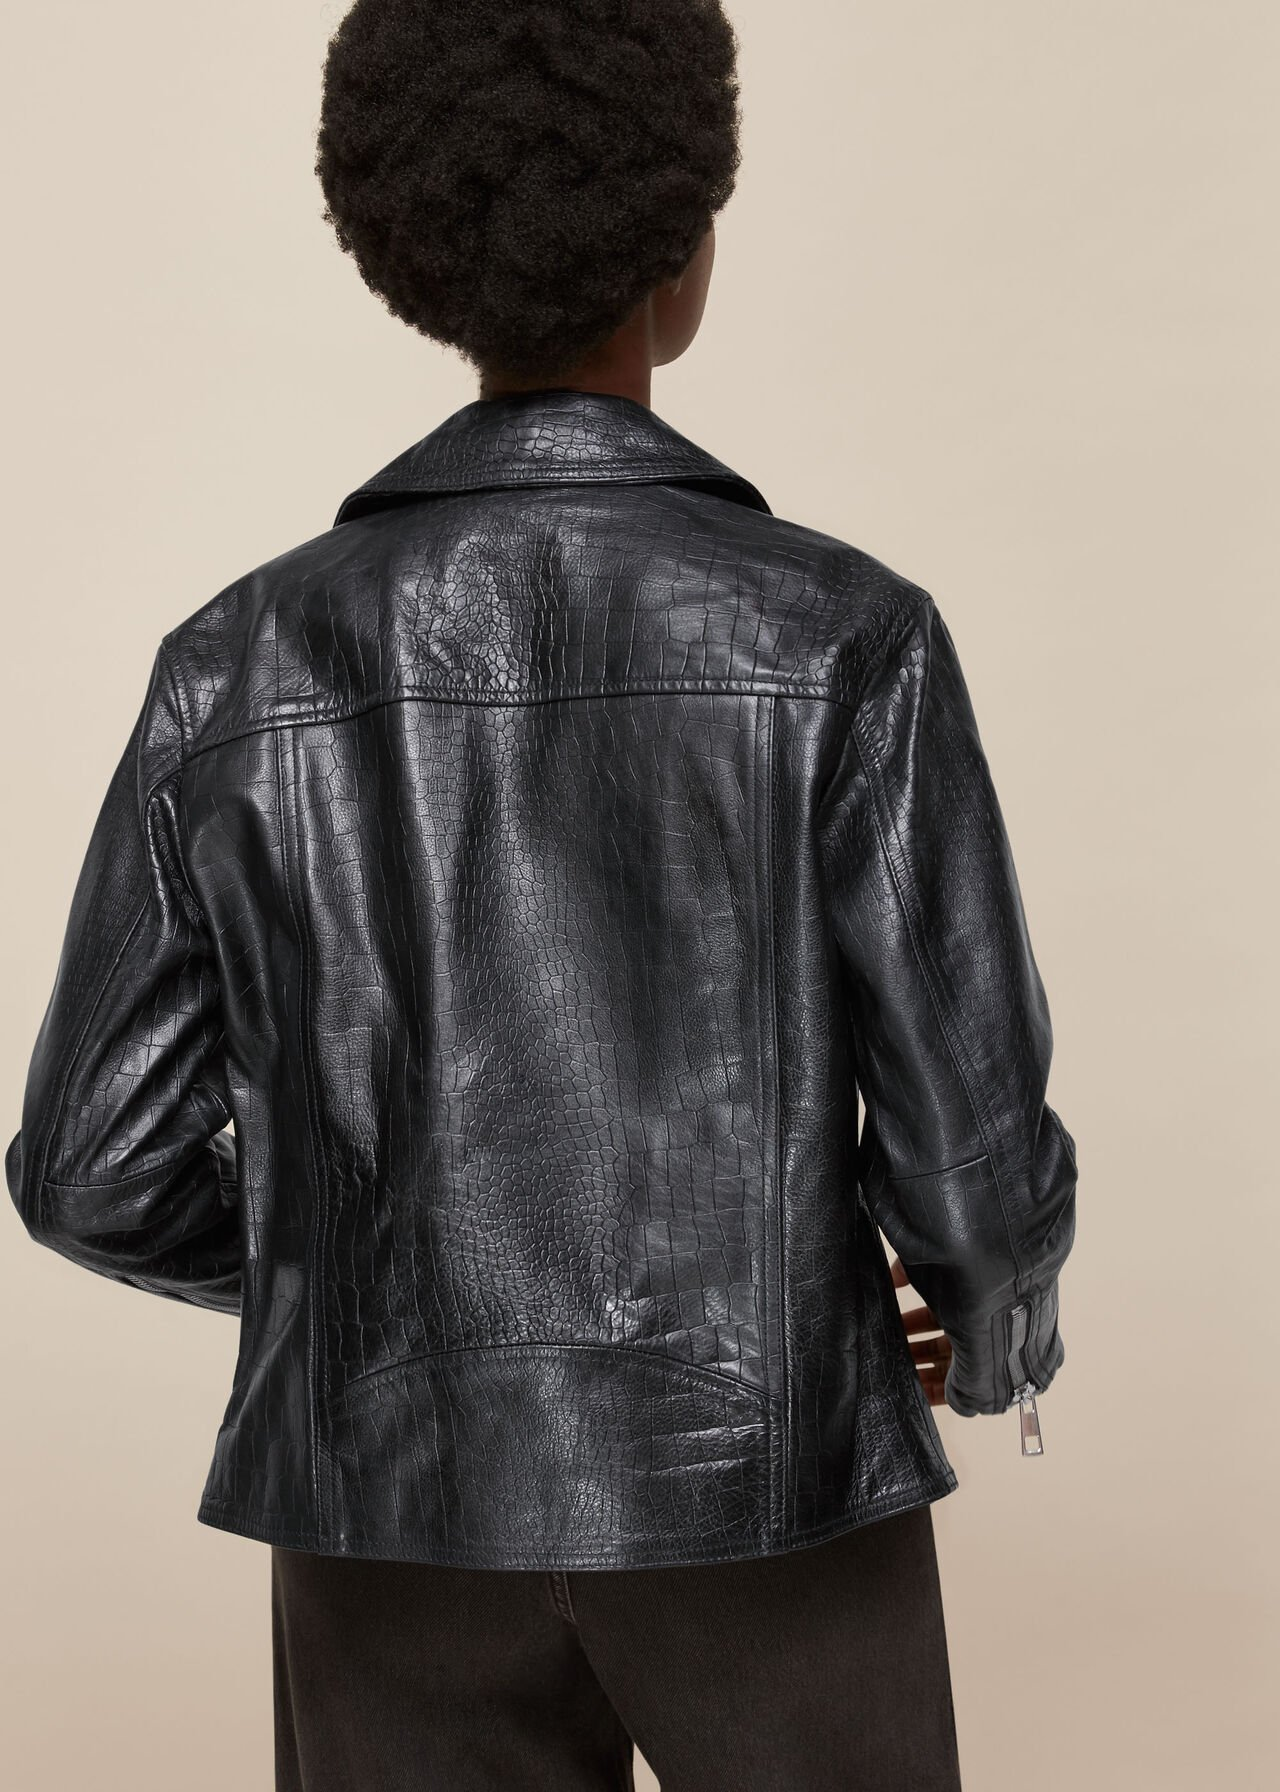 Adriana Leather Croc Biker Black